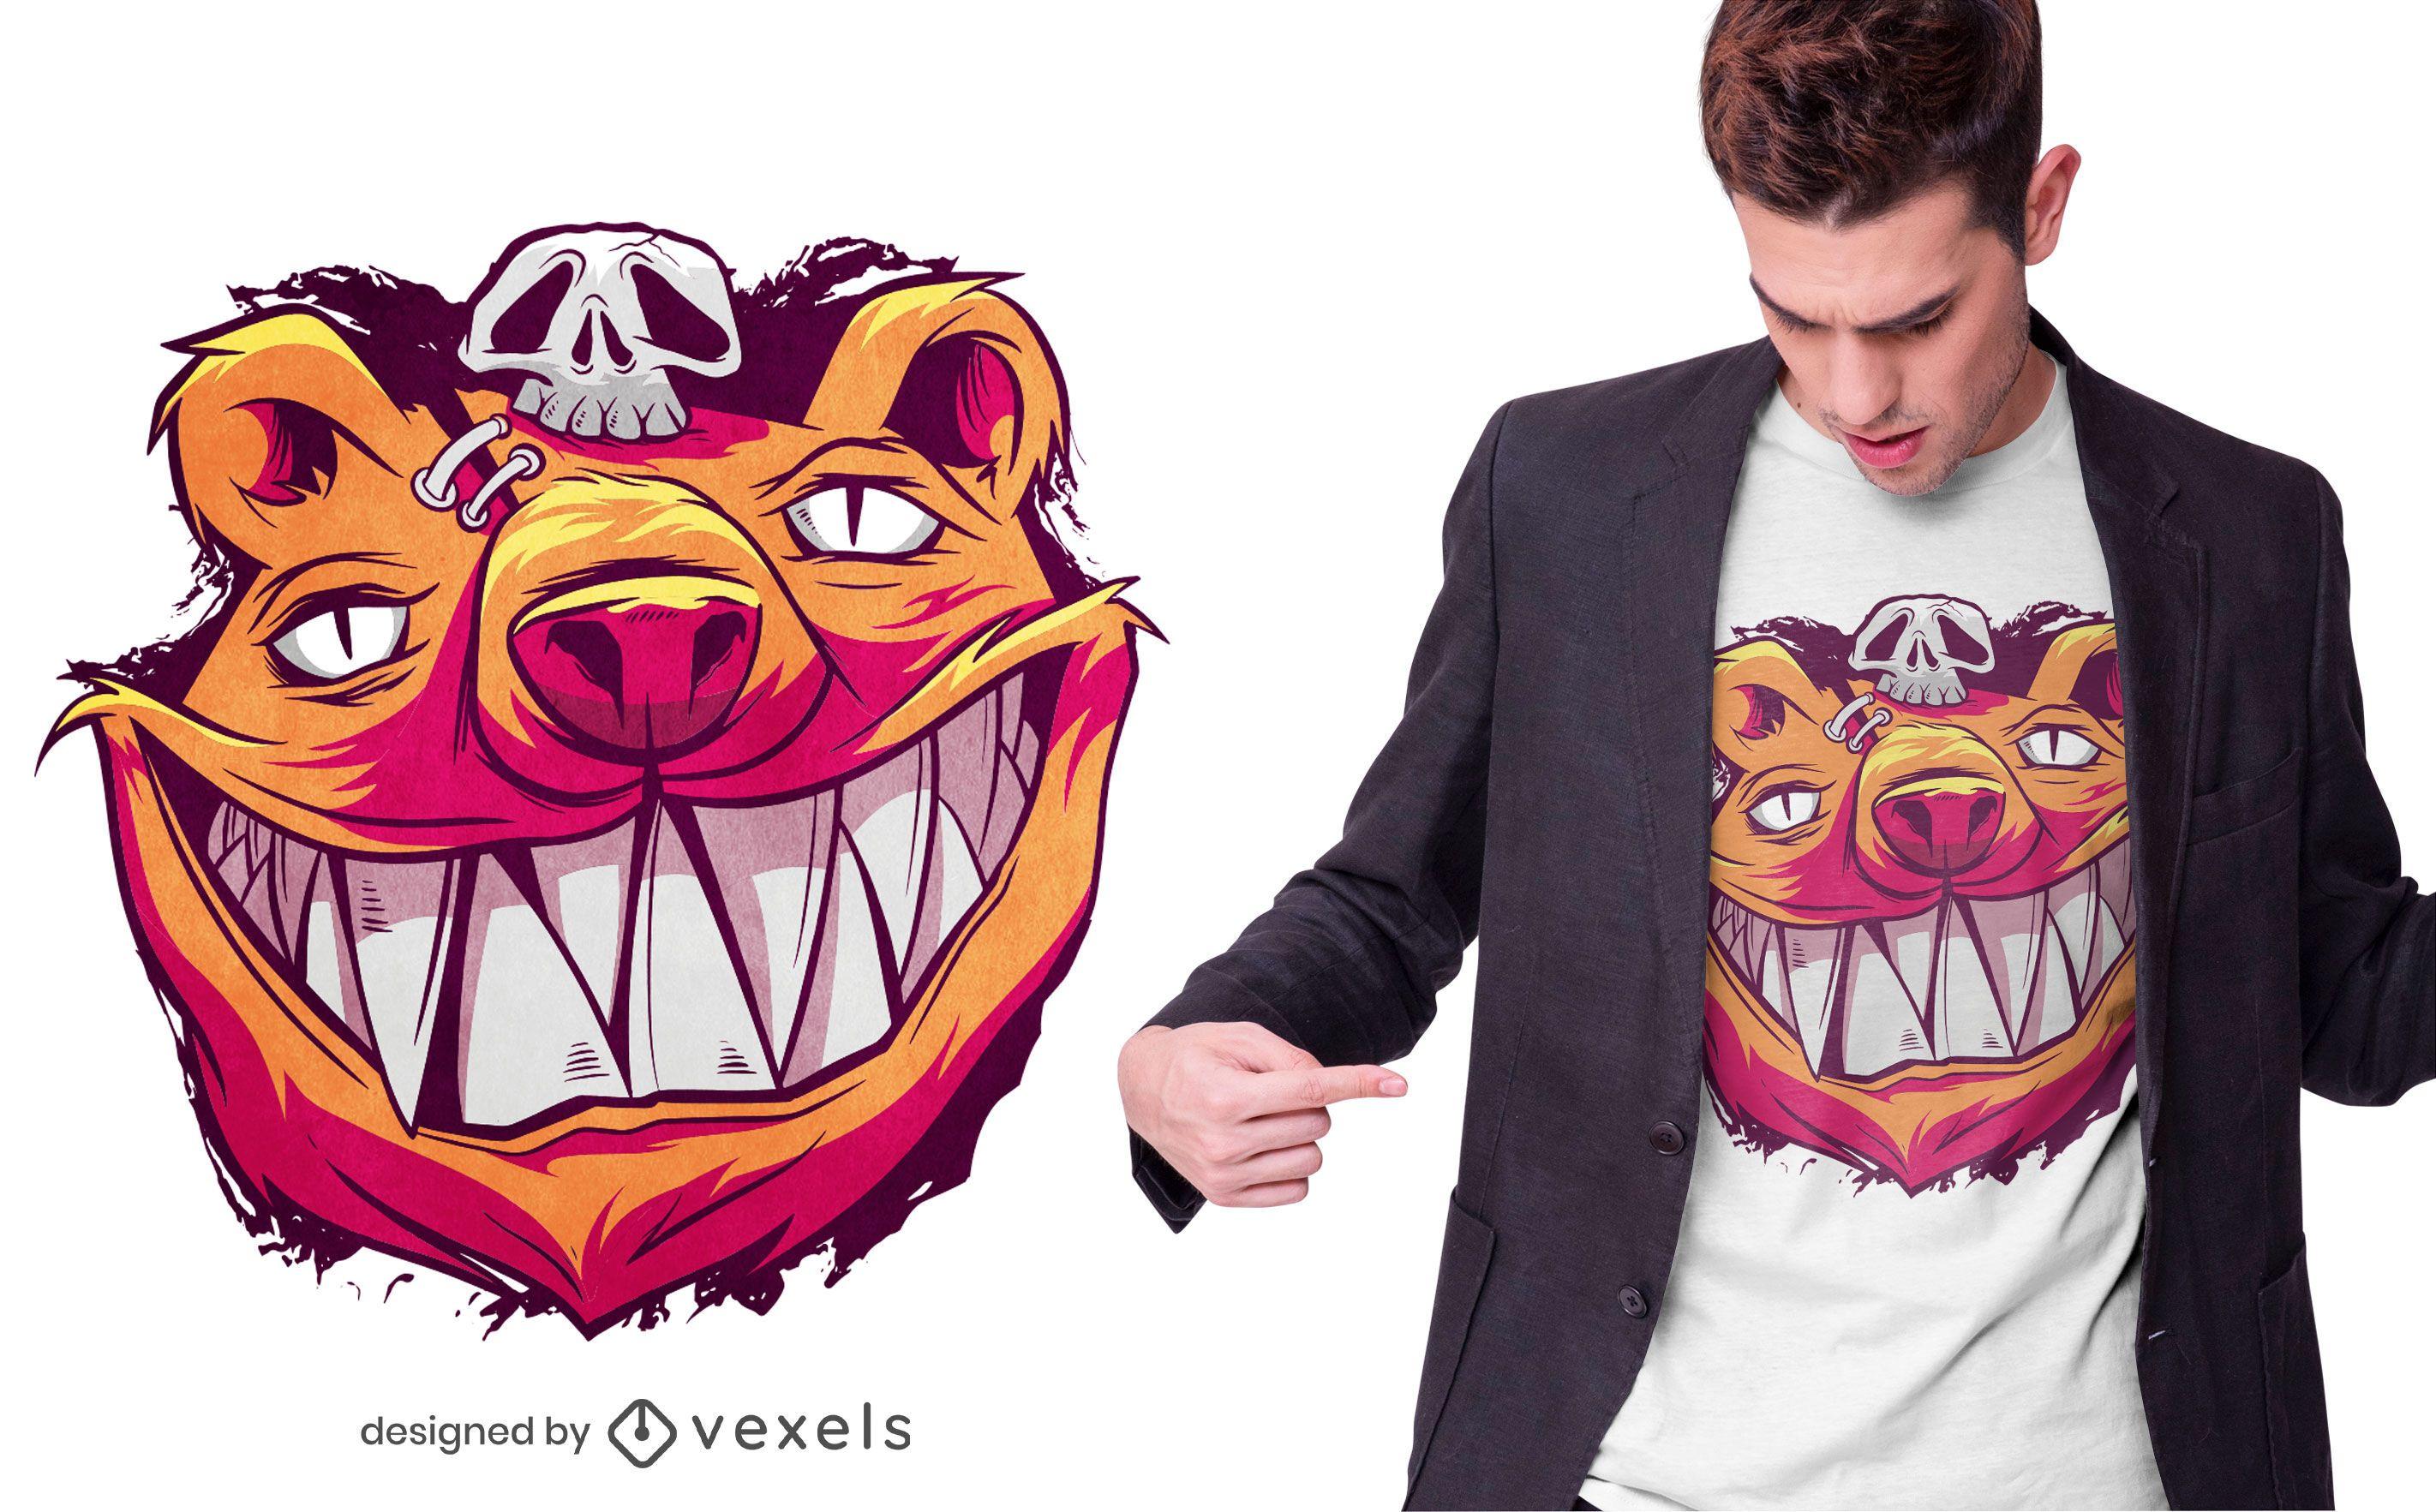 Scary bear t-shirt design